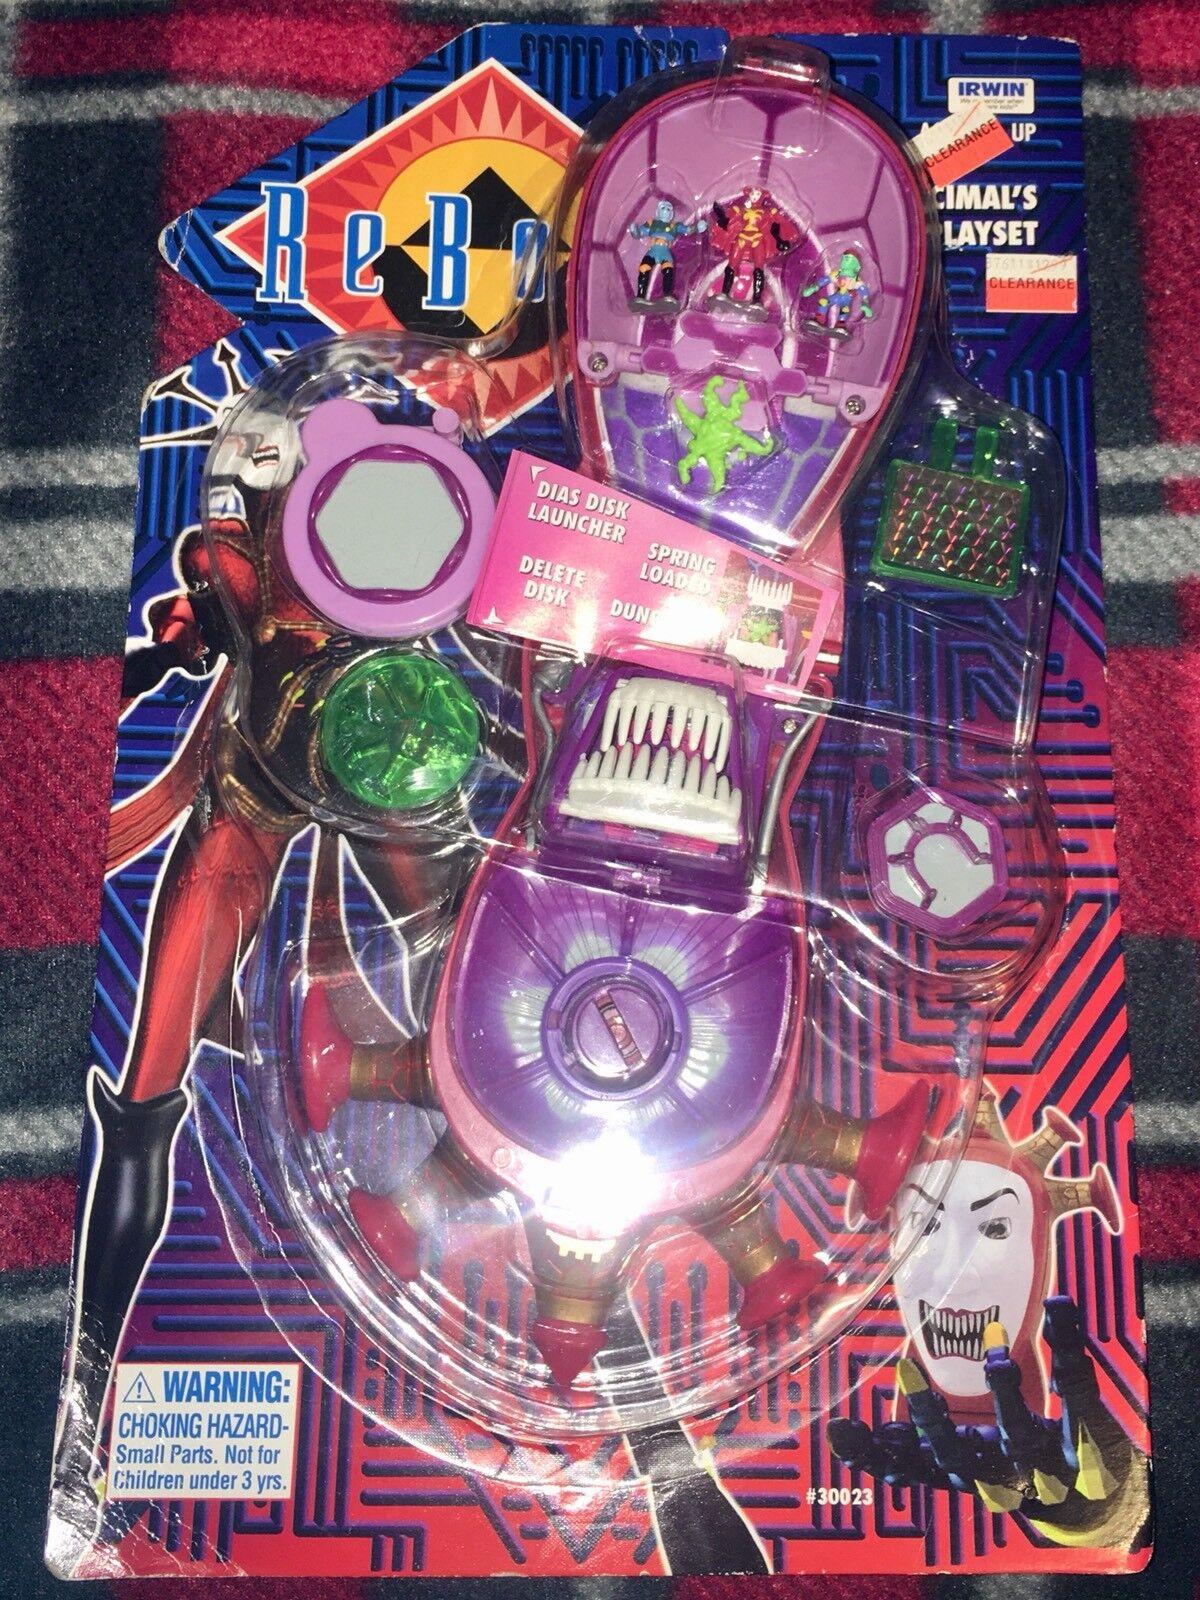 ReStiefel 1995 NEW Hexadecimal's Lair Playset  30023 Irwin Micro Toy HTF RARE OOP